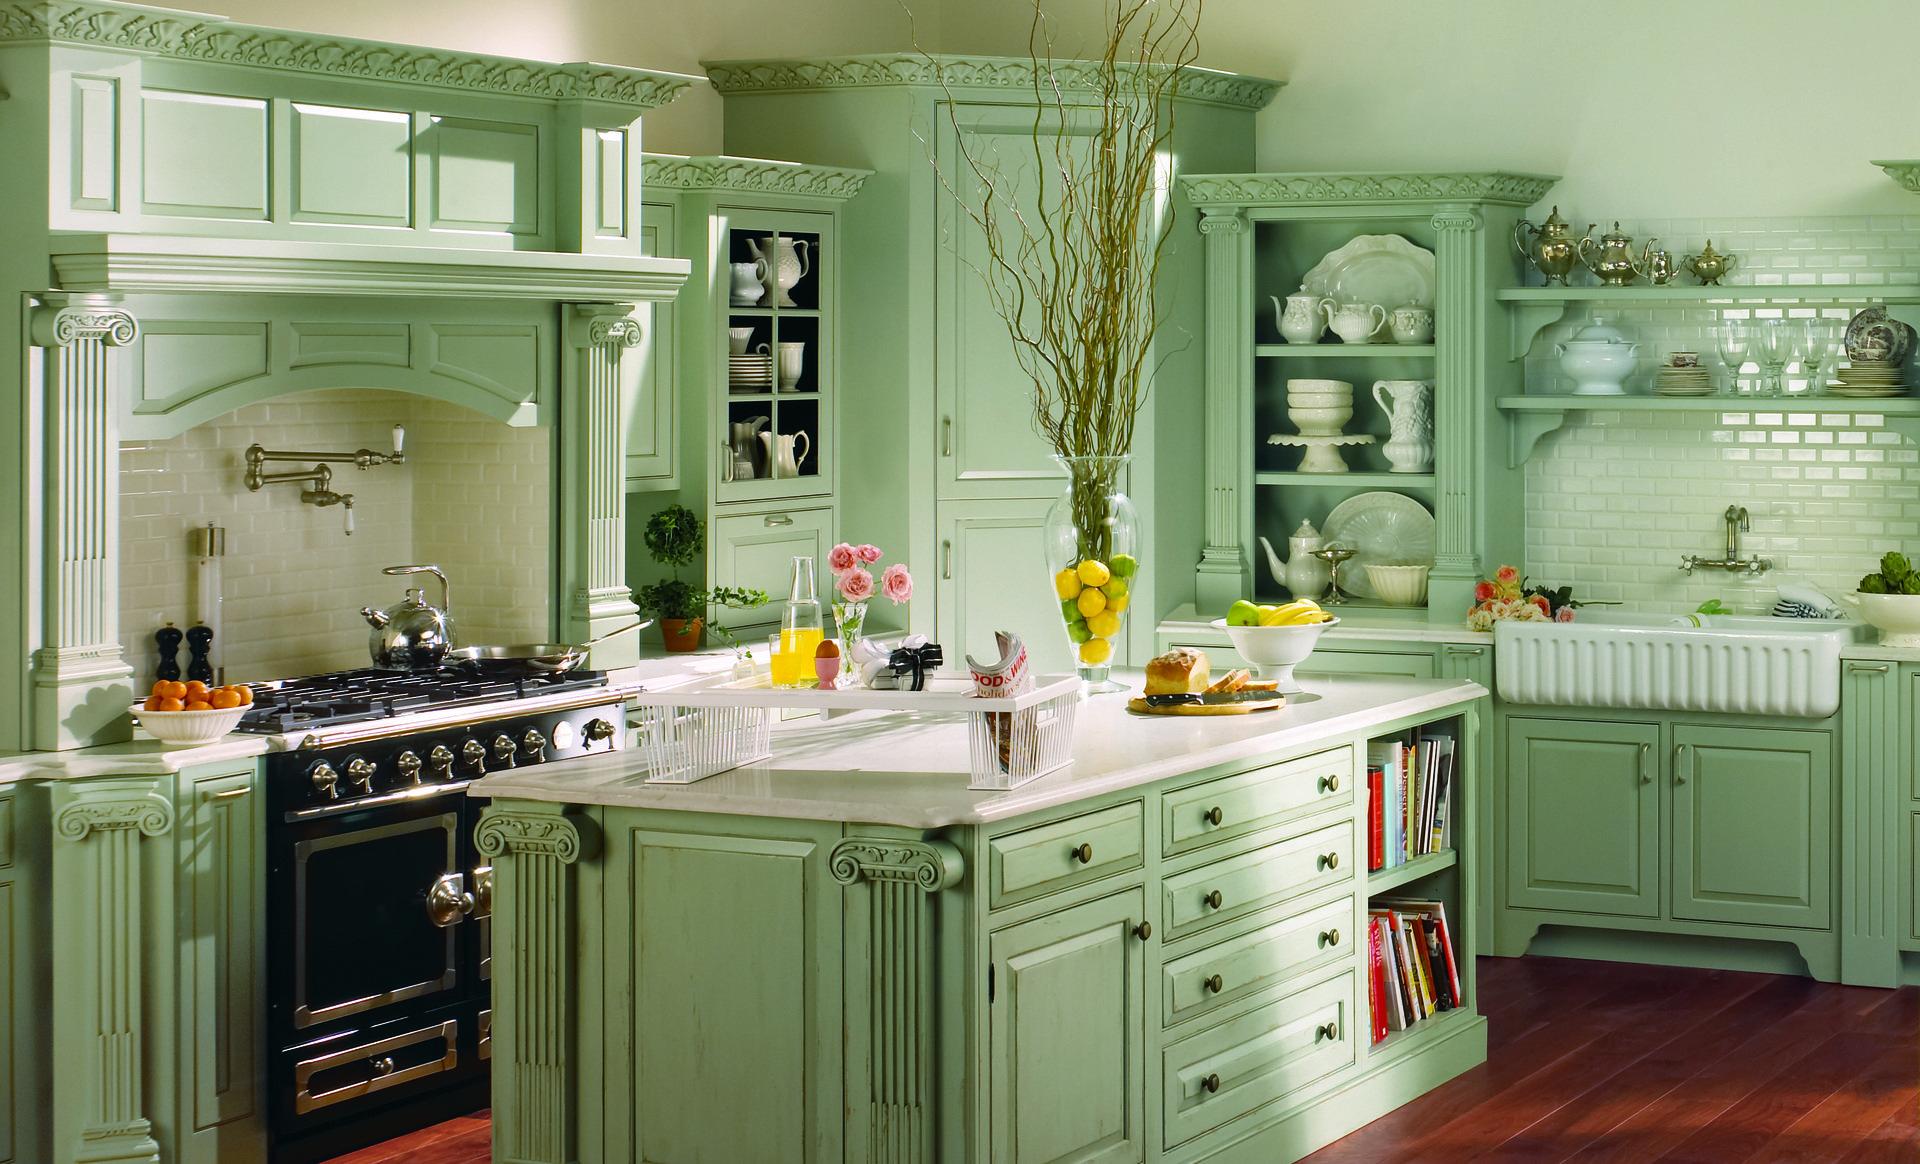 Cabinet craftsman